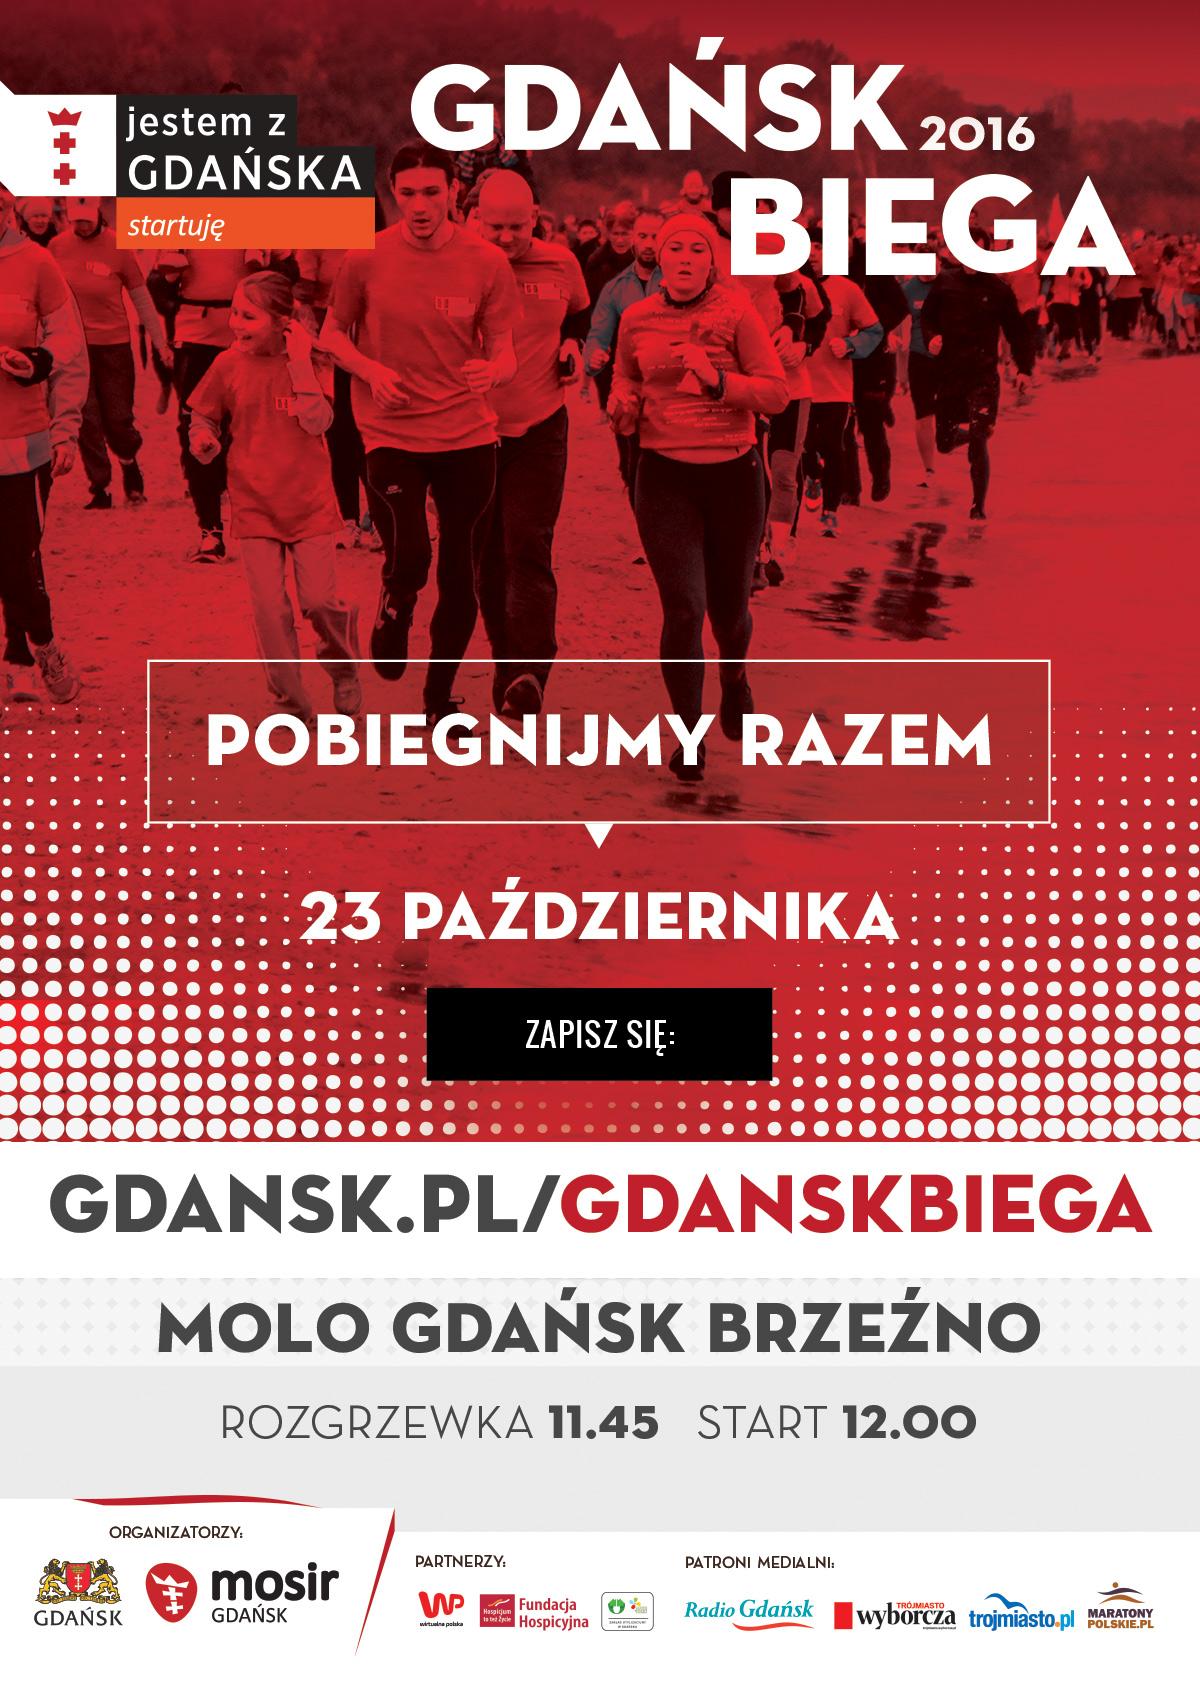 gdansk_biega_2016_03